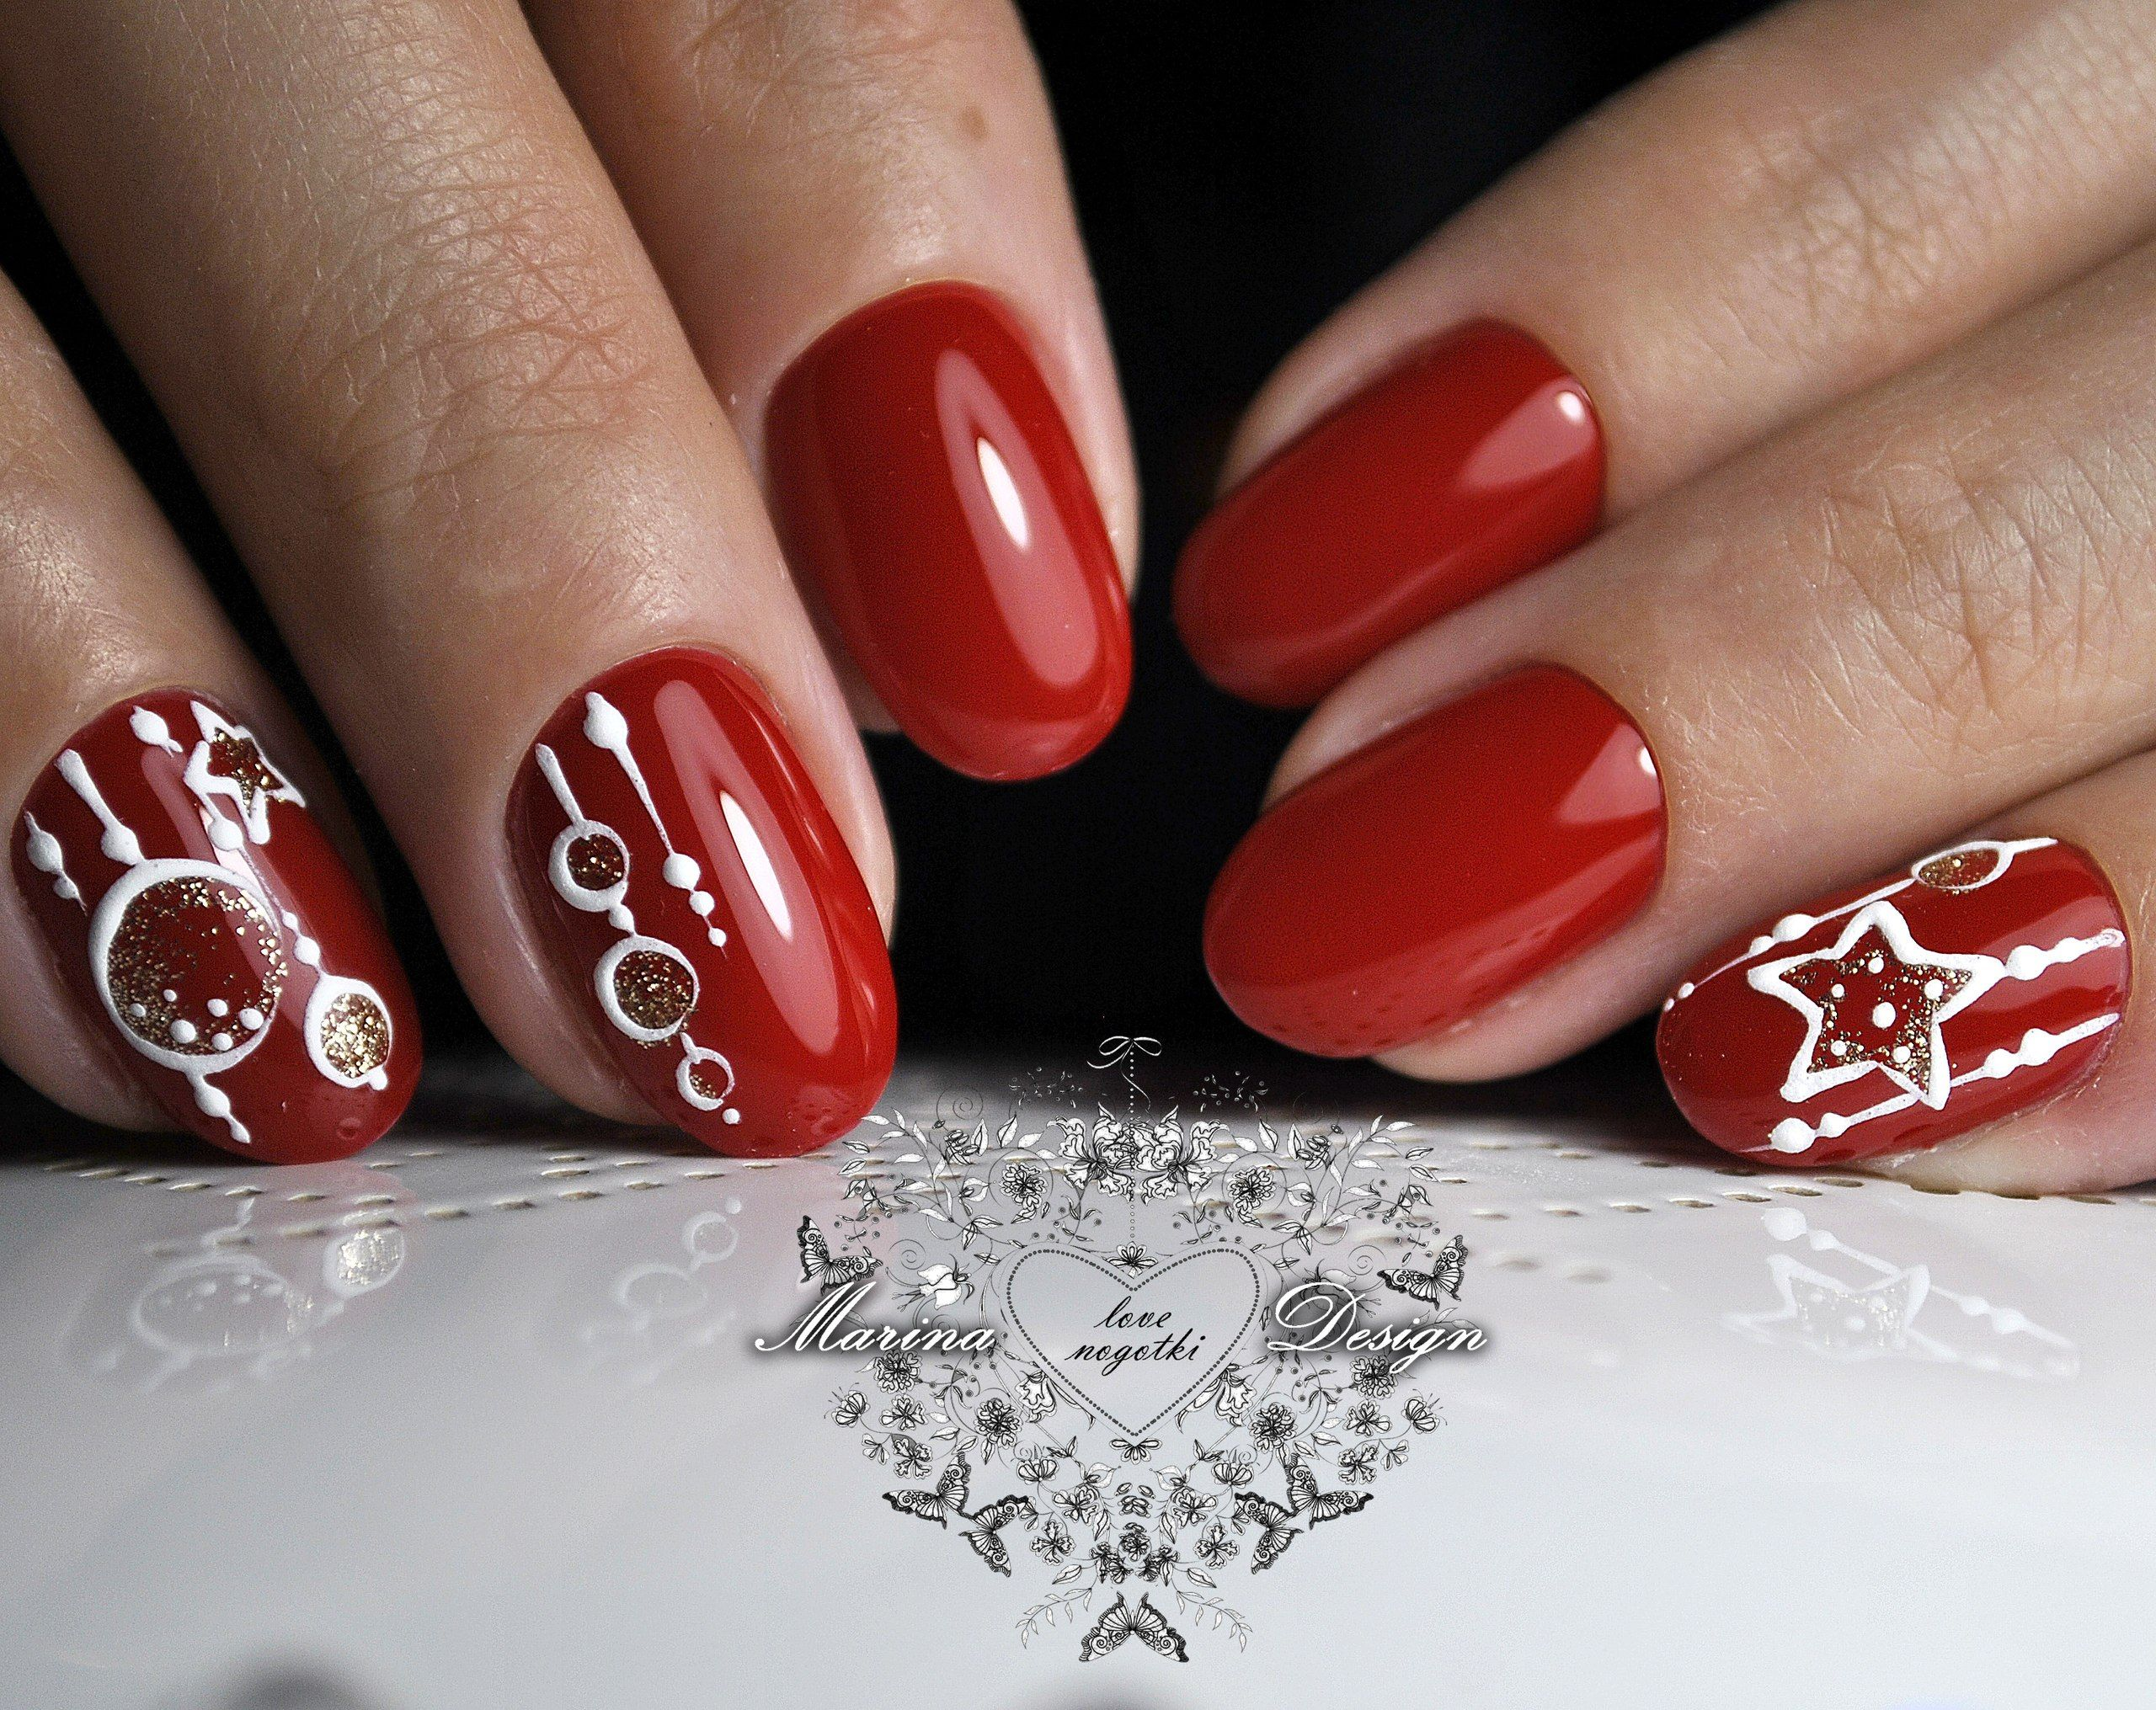 Pin de Beth Marie en Nails! | Pinterest | Diseño de navidad, Arte ...